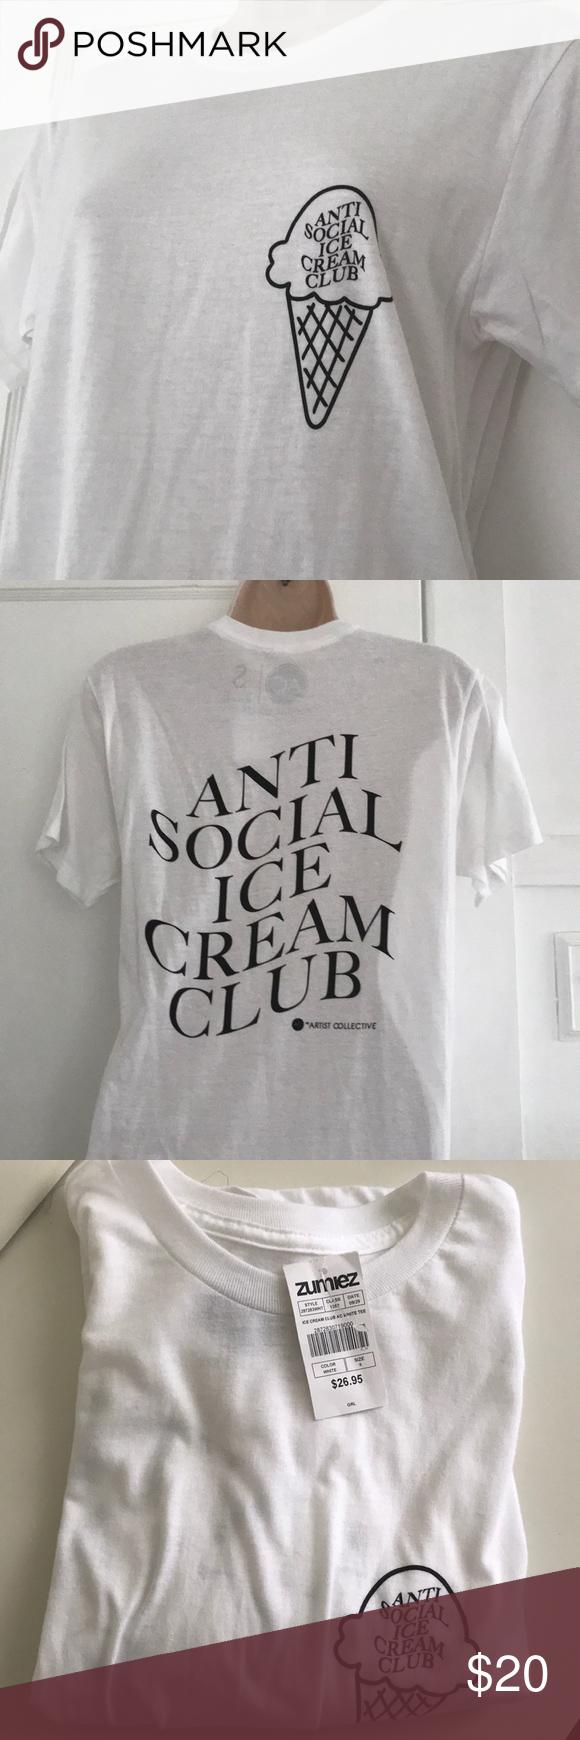 Assc T Shirt Shirts Unisex Shirt Club Shirts